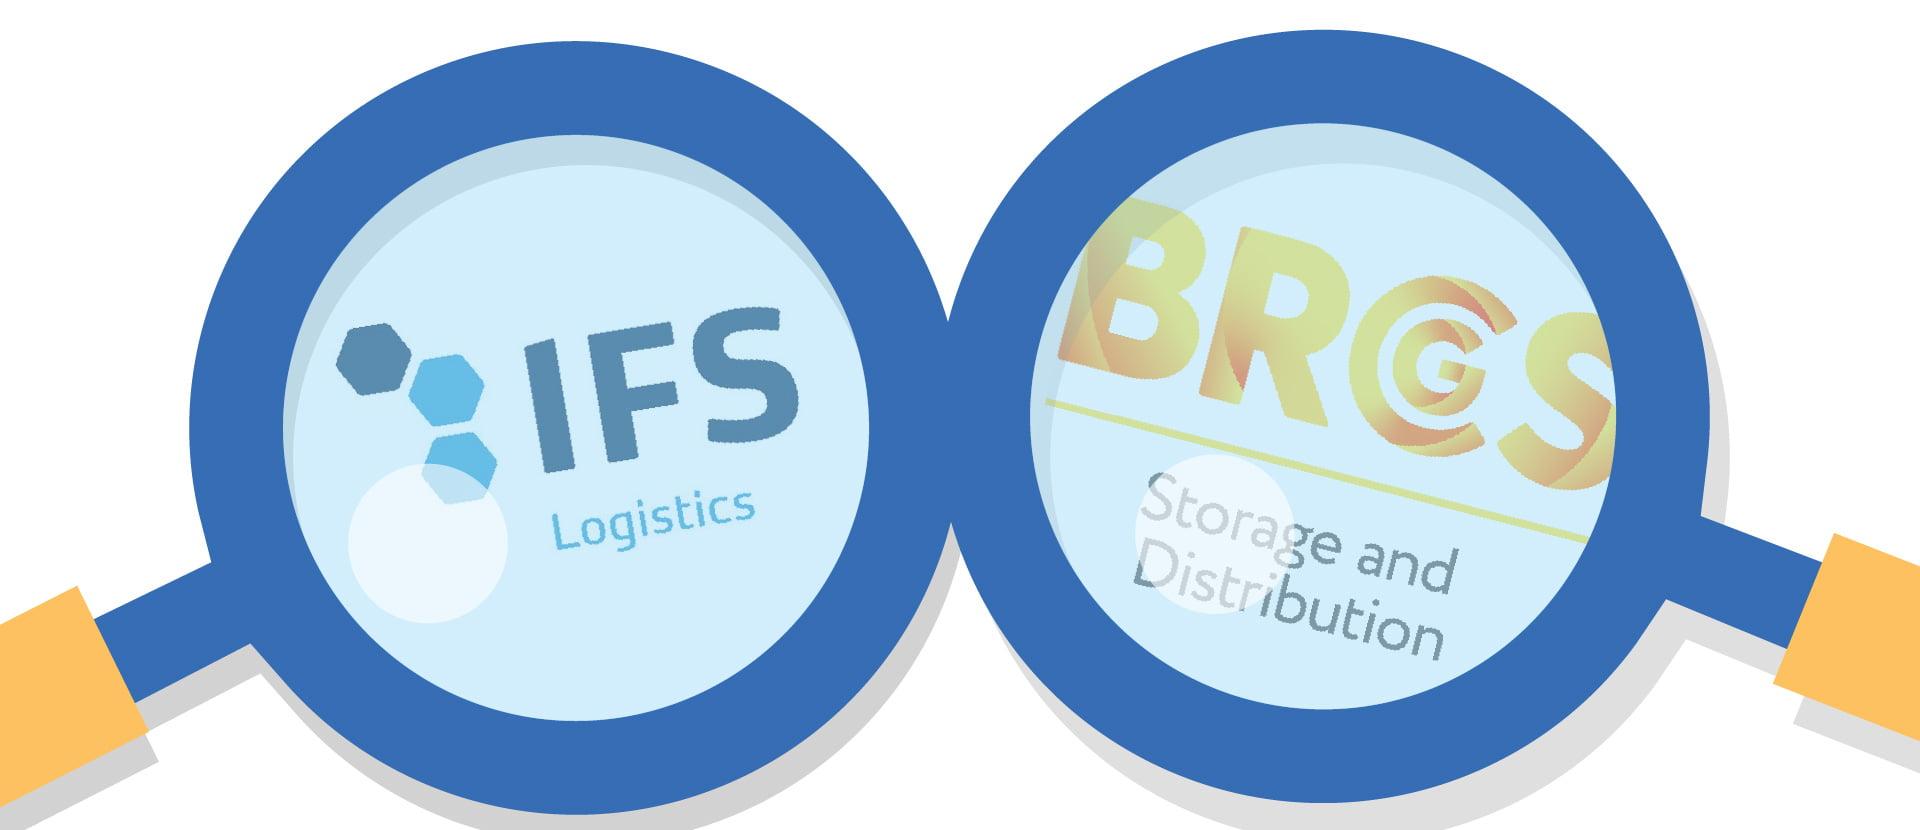 BRCGS Stirage & Distribrition vs IFS Logistics